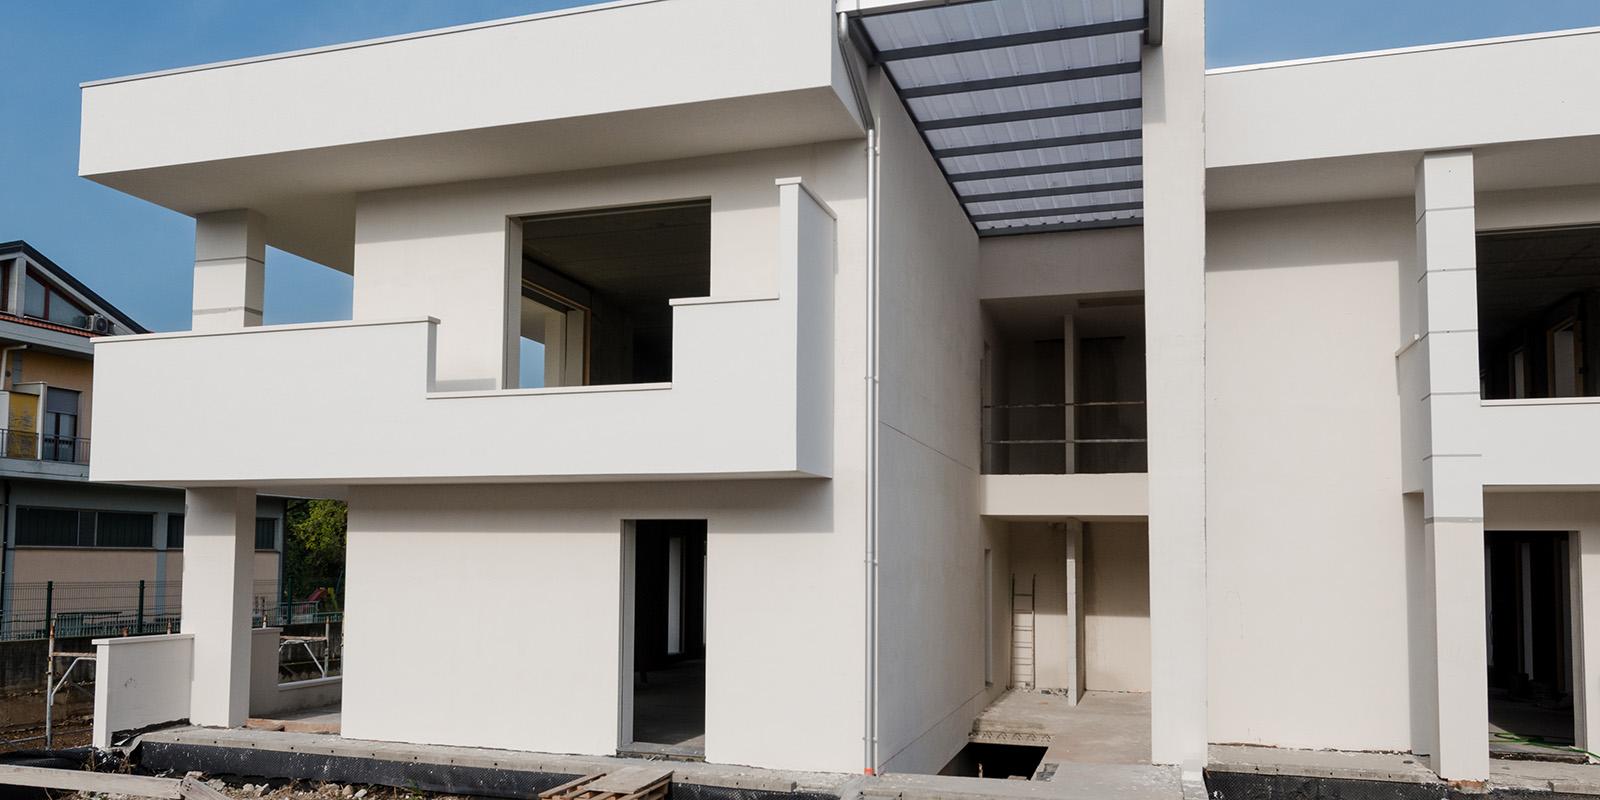 Epis_Bagnatica_Residenza_del_Sole_8